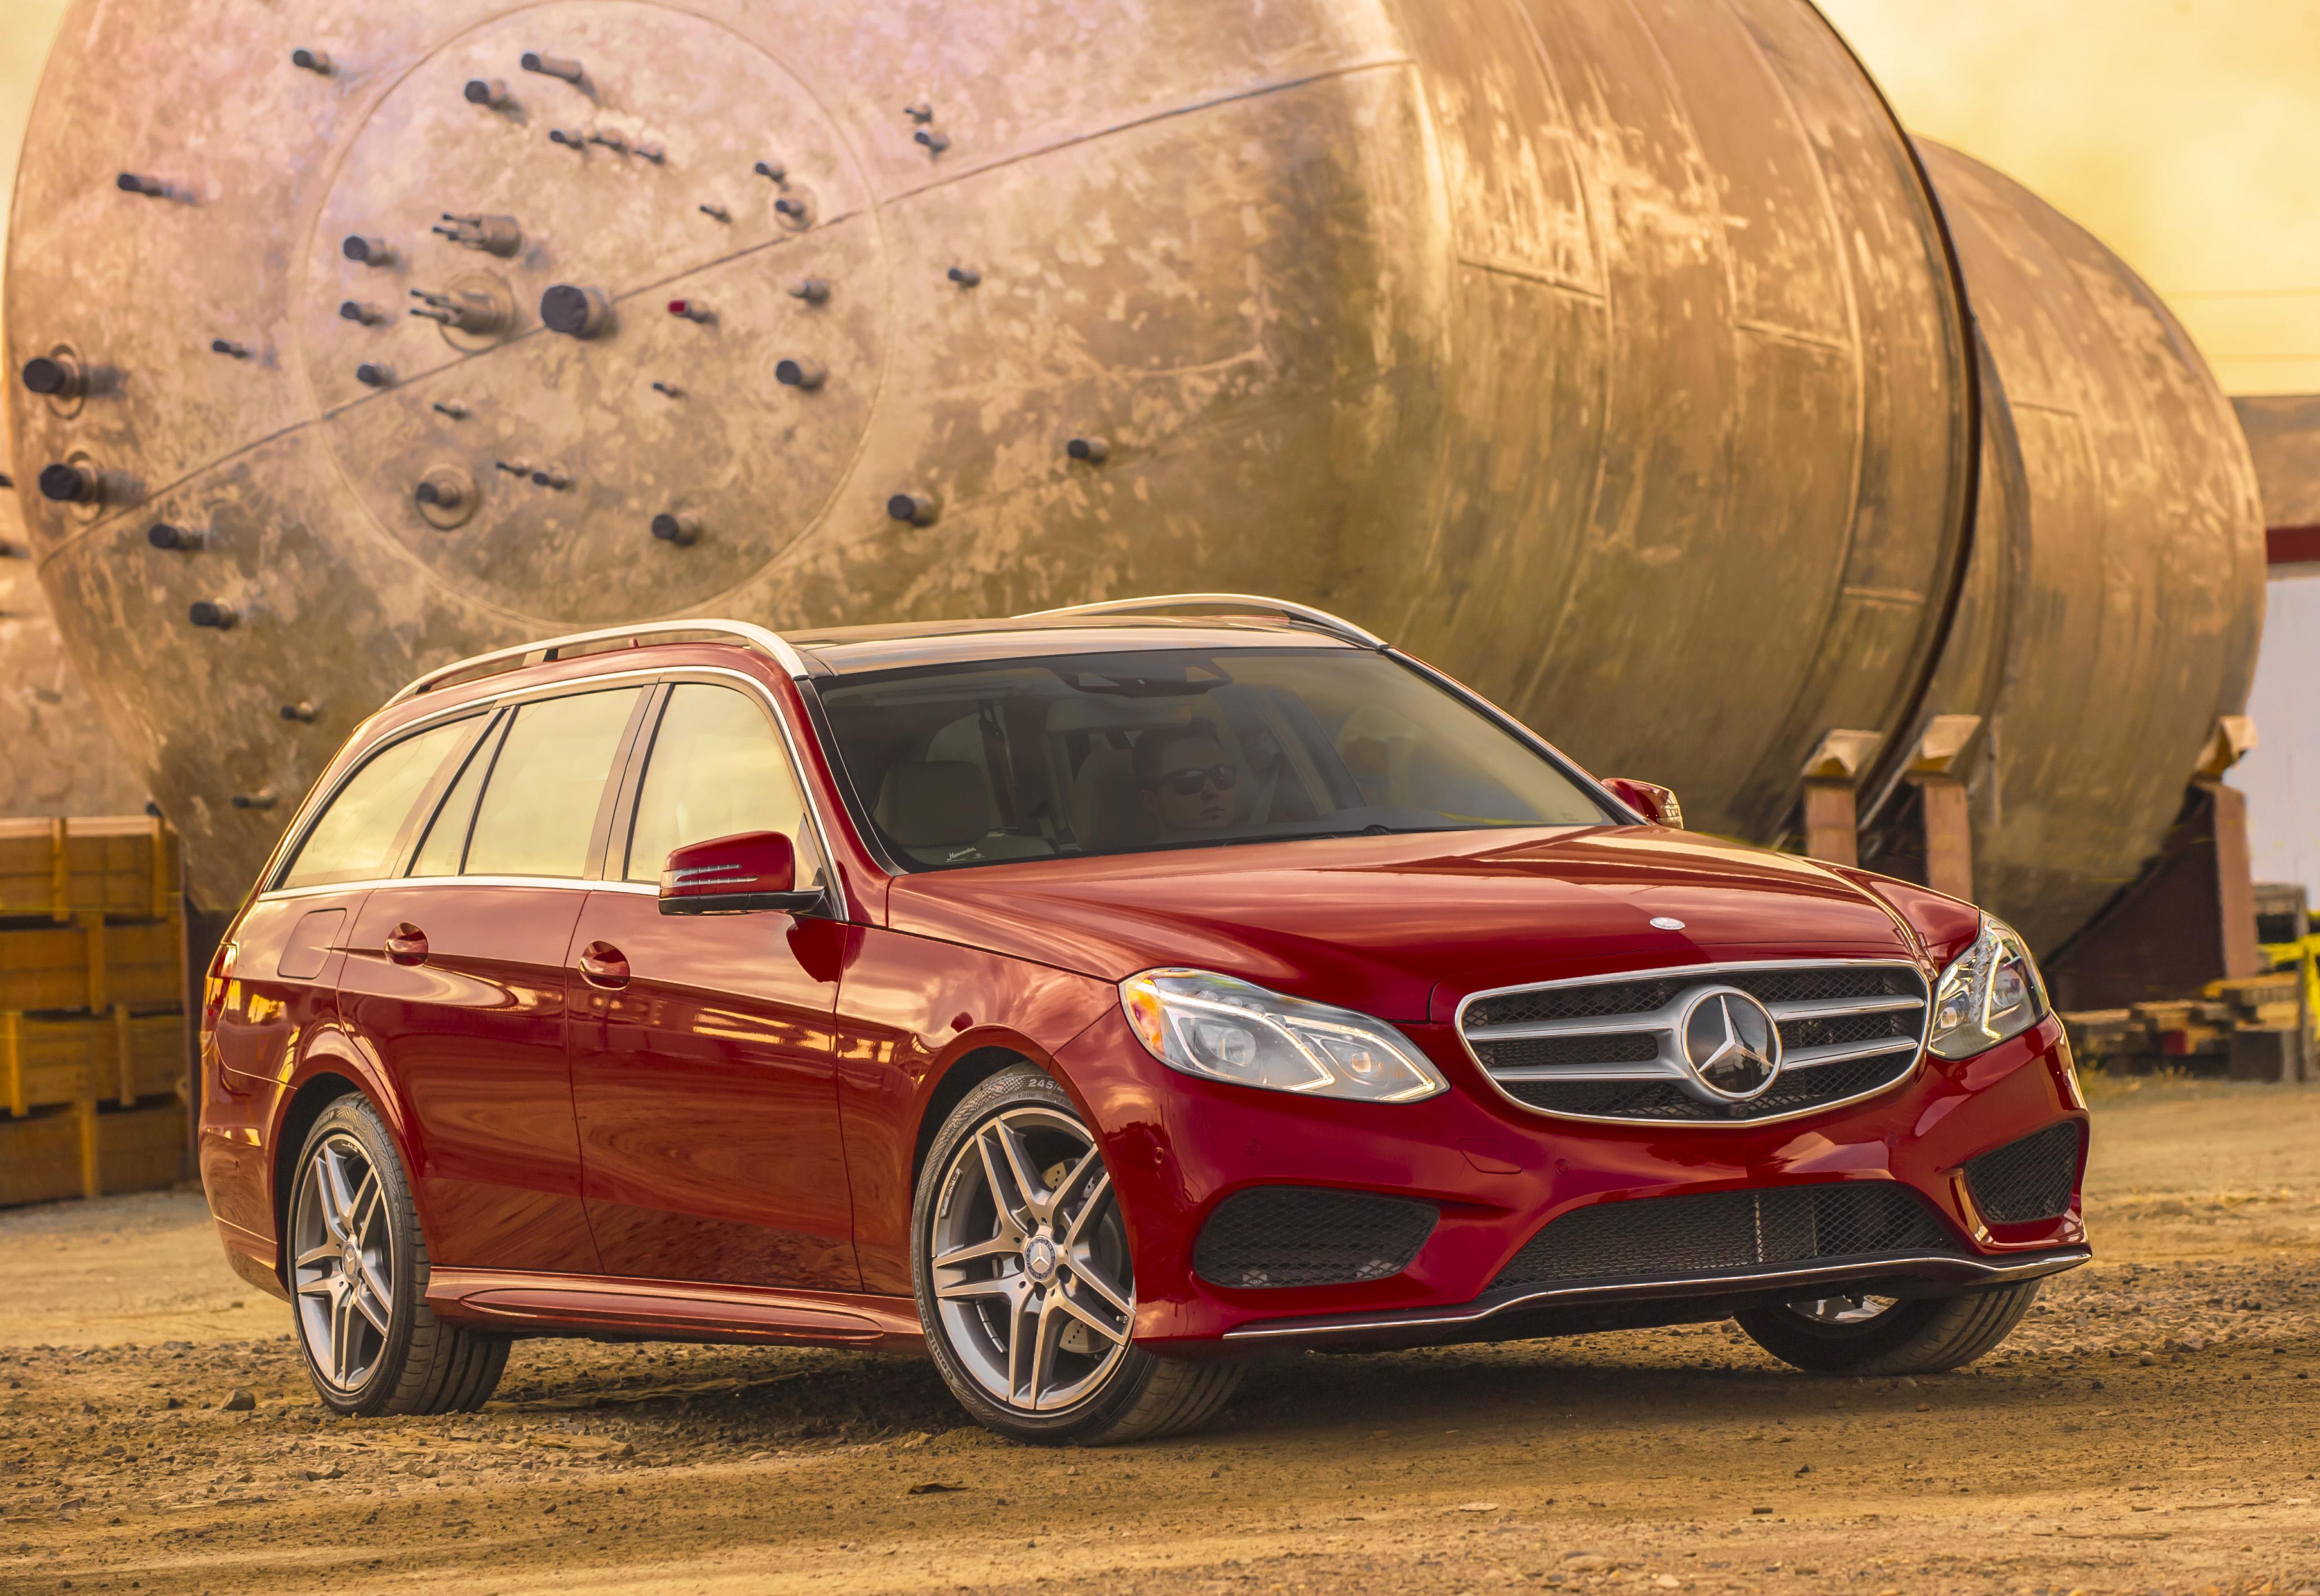 Seat time 2014 mercedes benz e350 4matic wagon john 39 s for Mercedes benz e350 4matic wagon